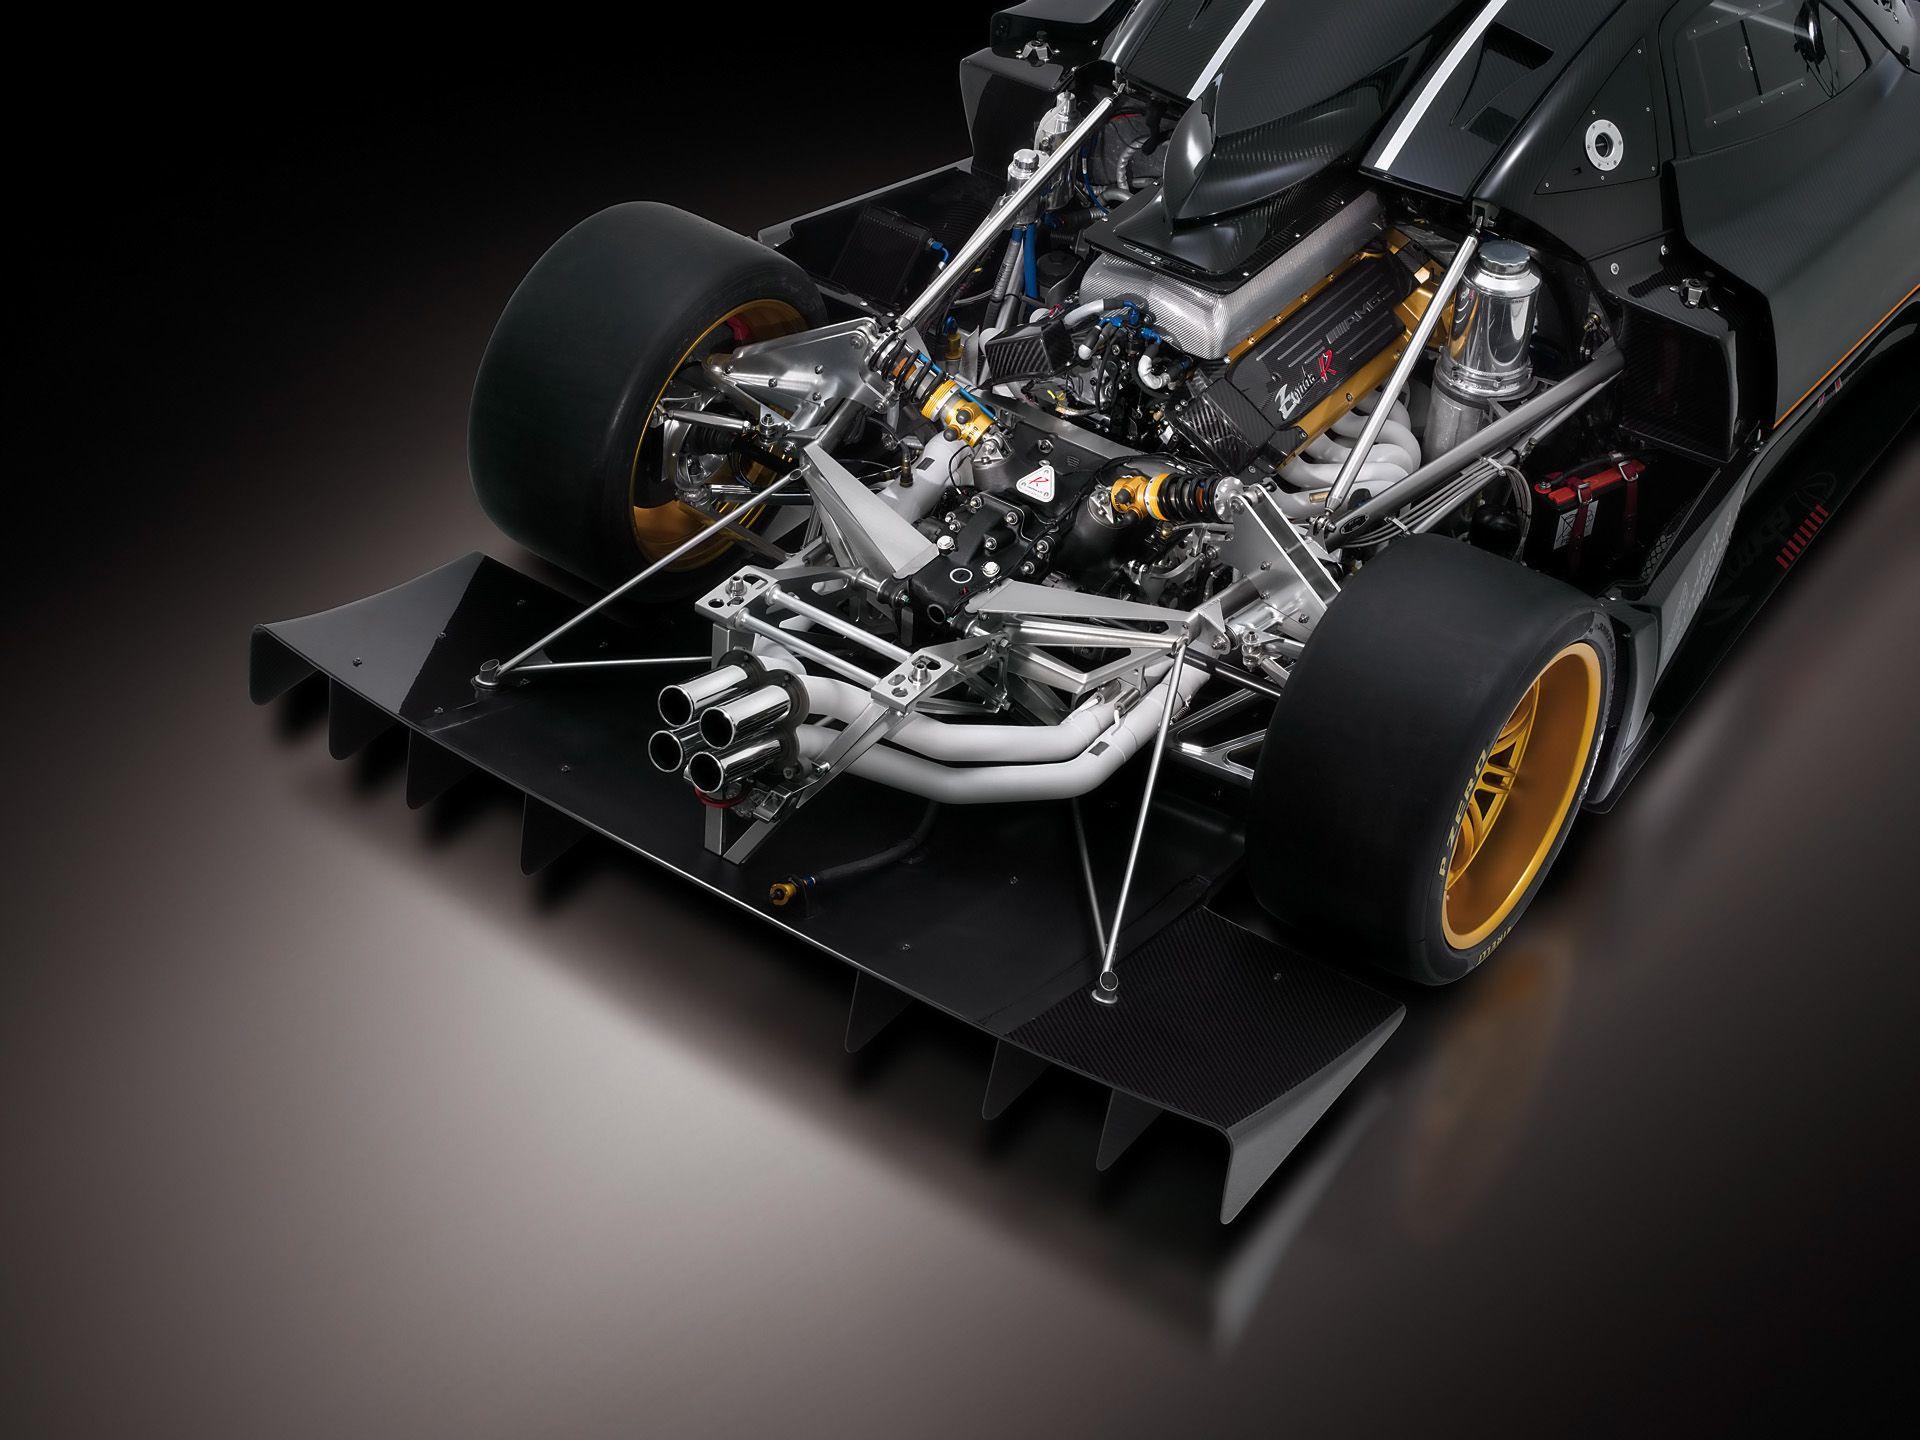 Pagani Zonda R | Pagani zonda, Engine and Cars